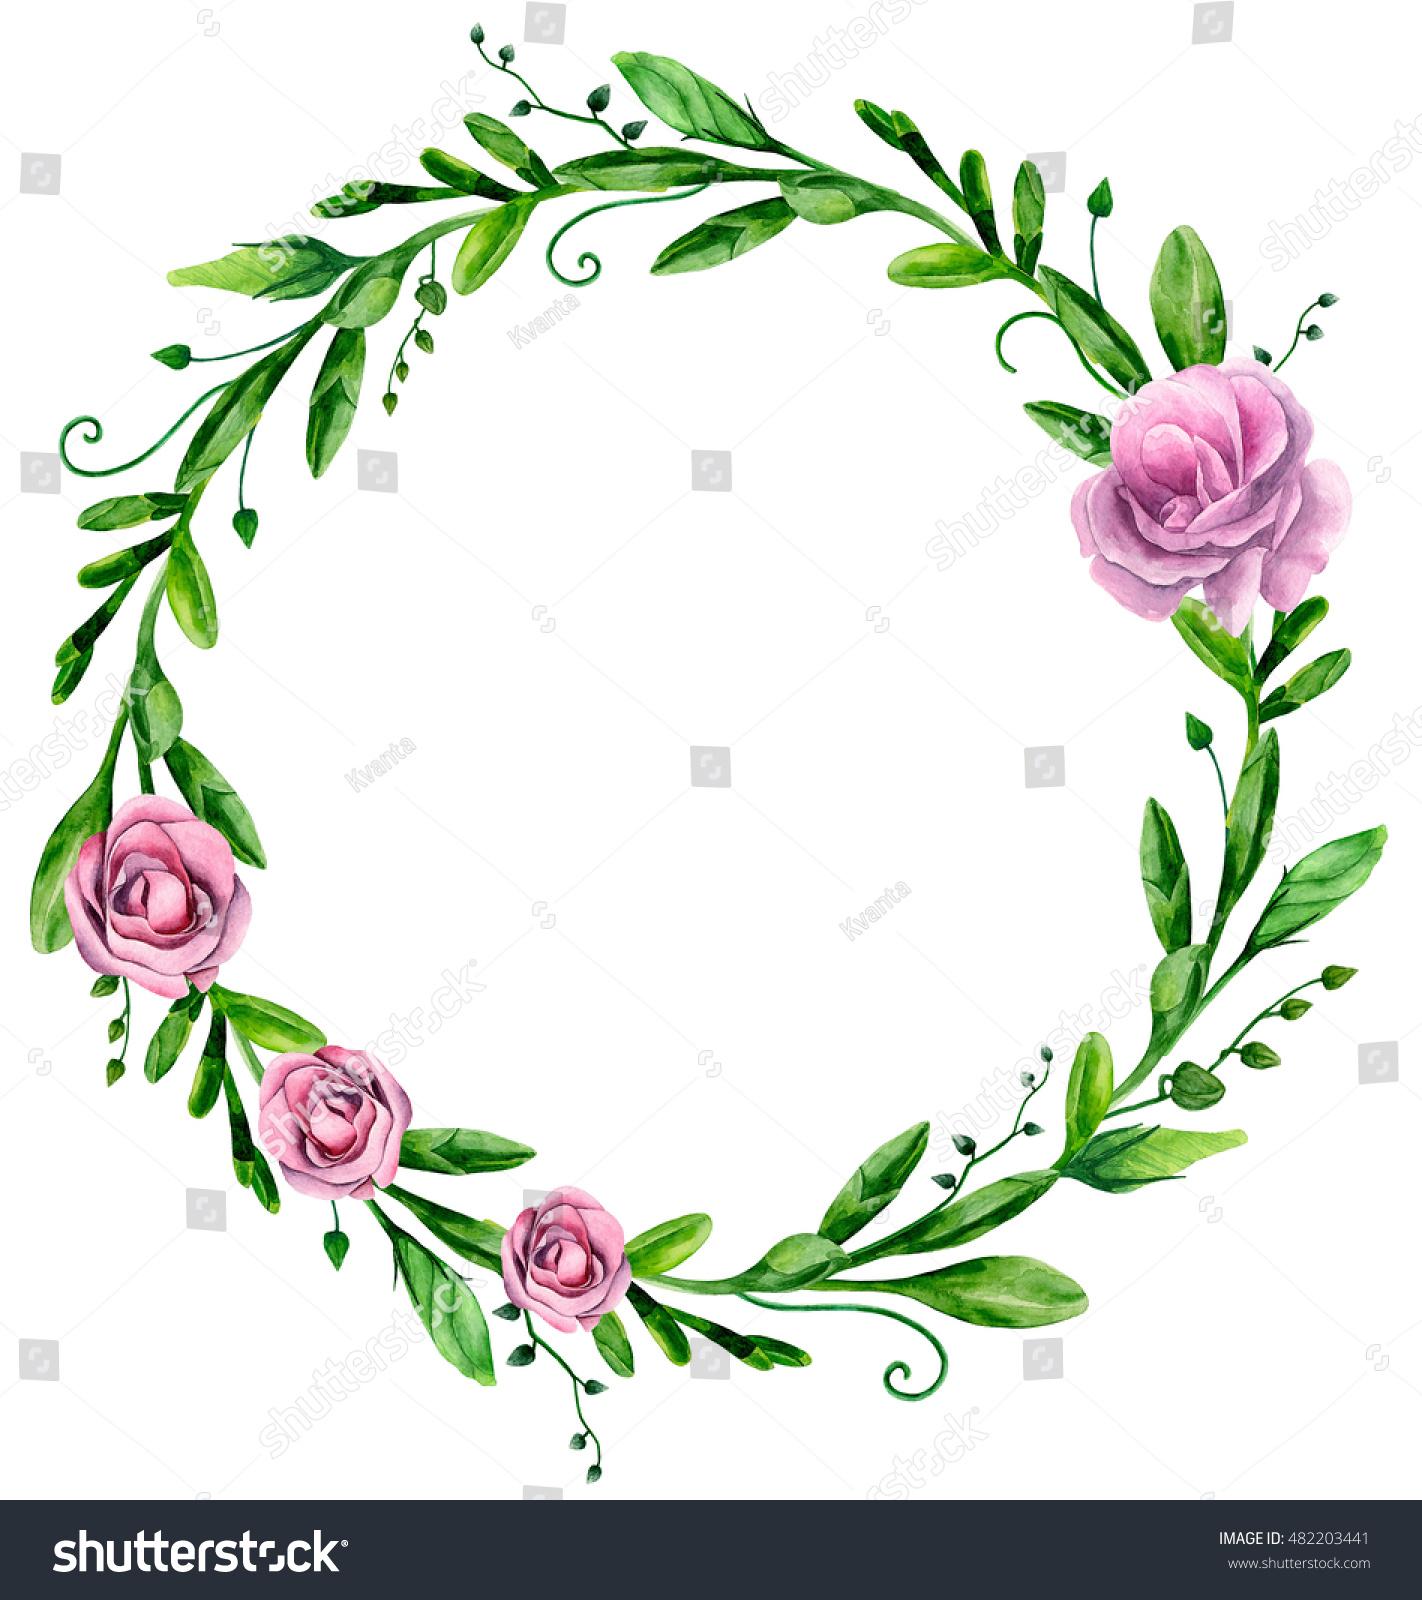 Watercolor greenery wreath flowers floral arrangement for Watercolor greenery